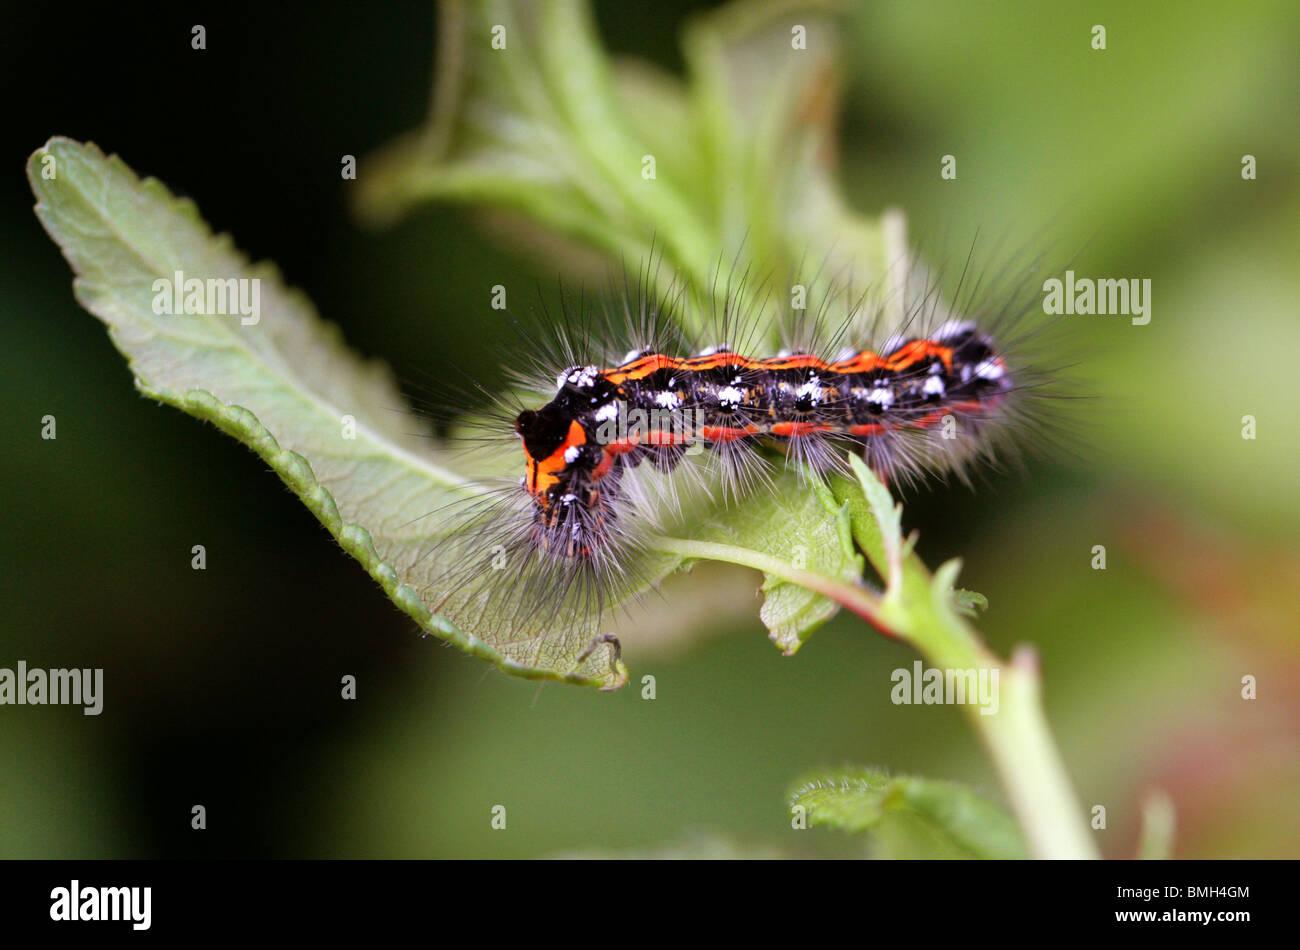 Dark Dagger, Acronicta tridens, Caterpillar (imago), Acronictinae, Noctuidae, Lepidoptera. - Stock Image